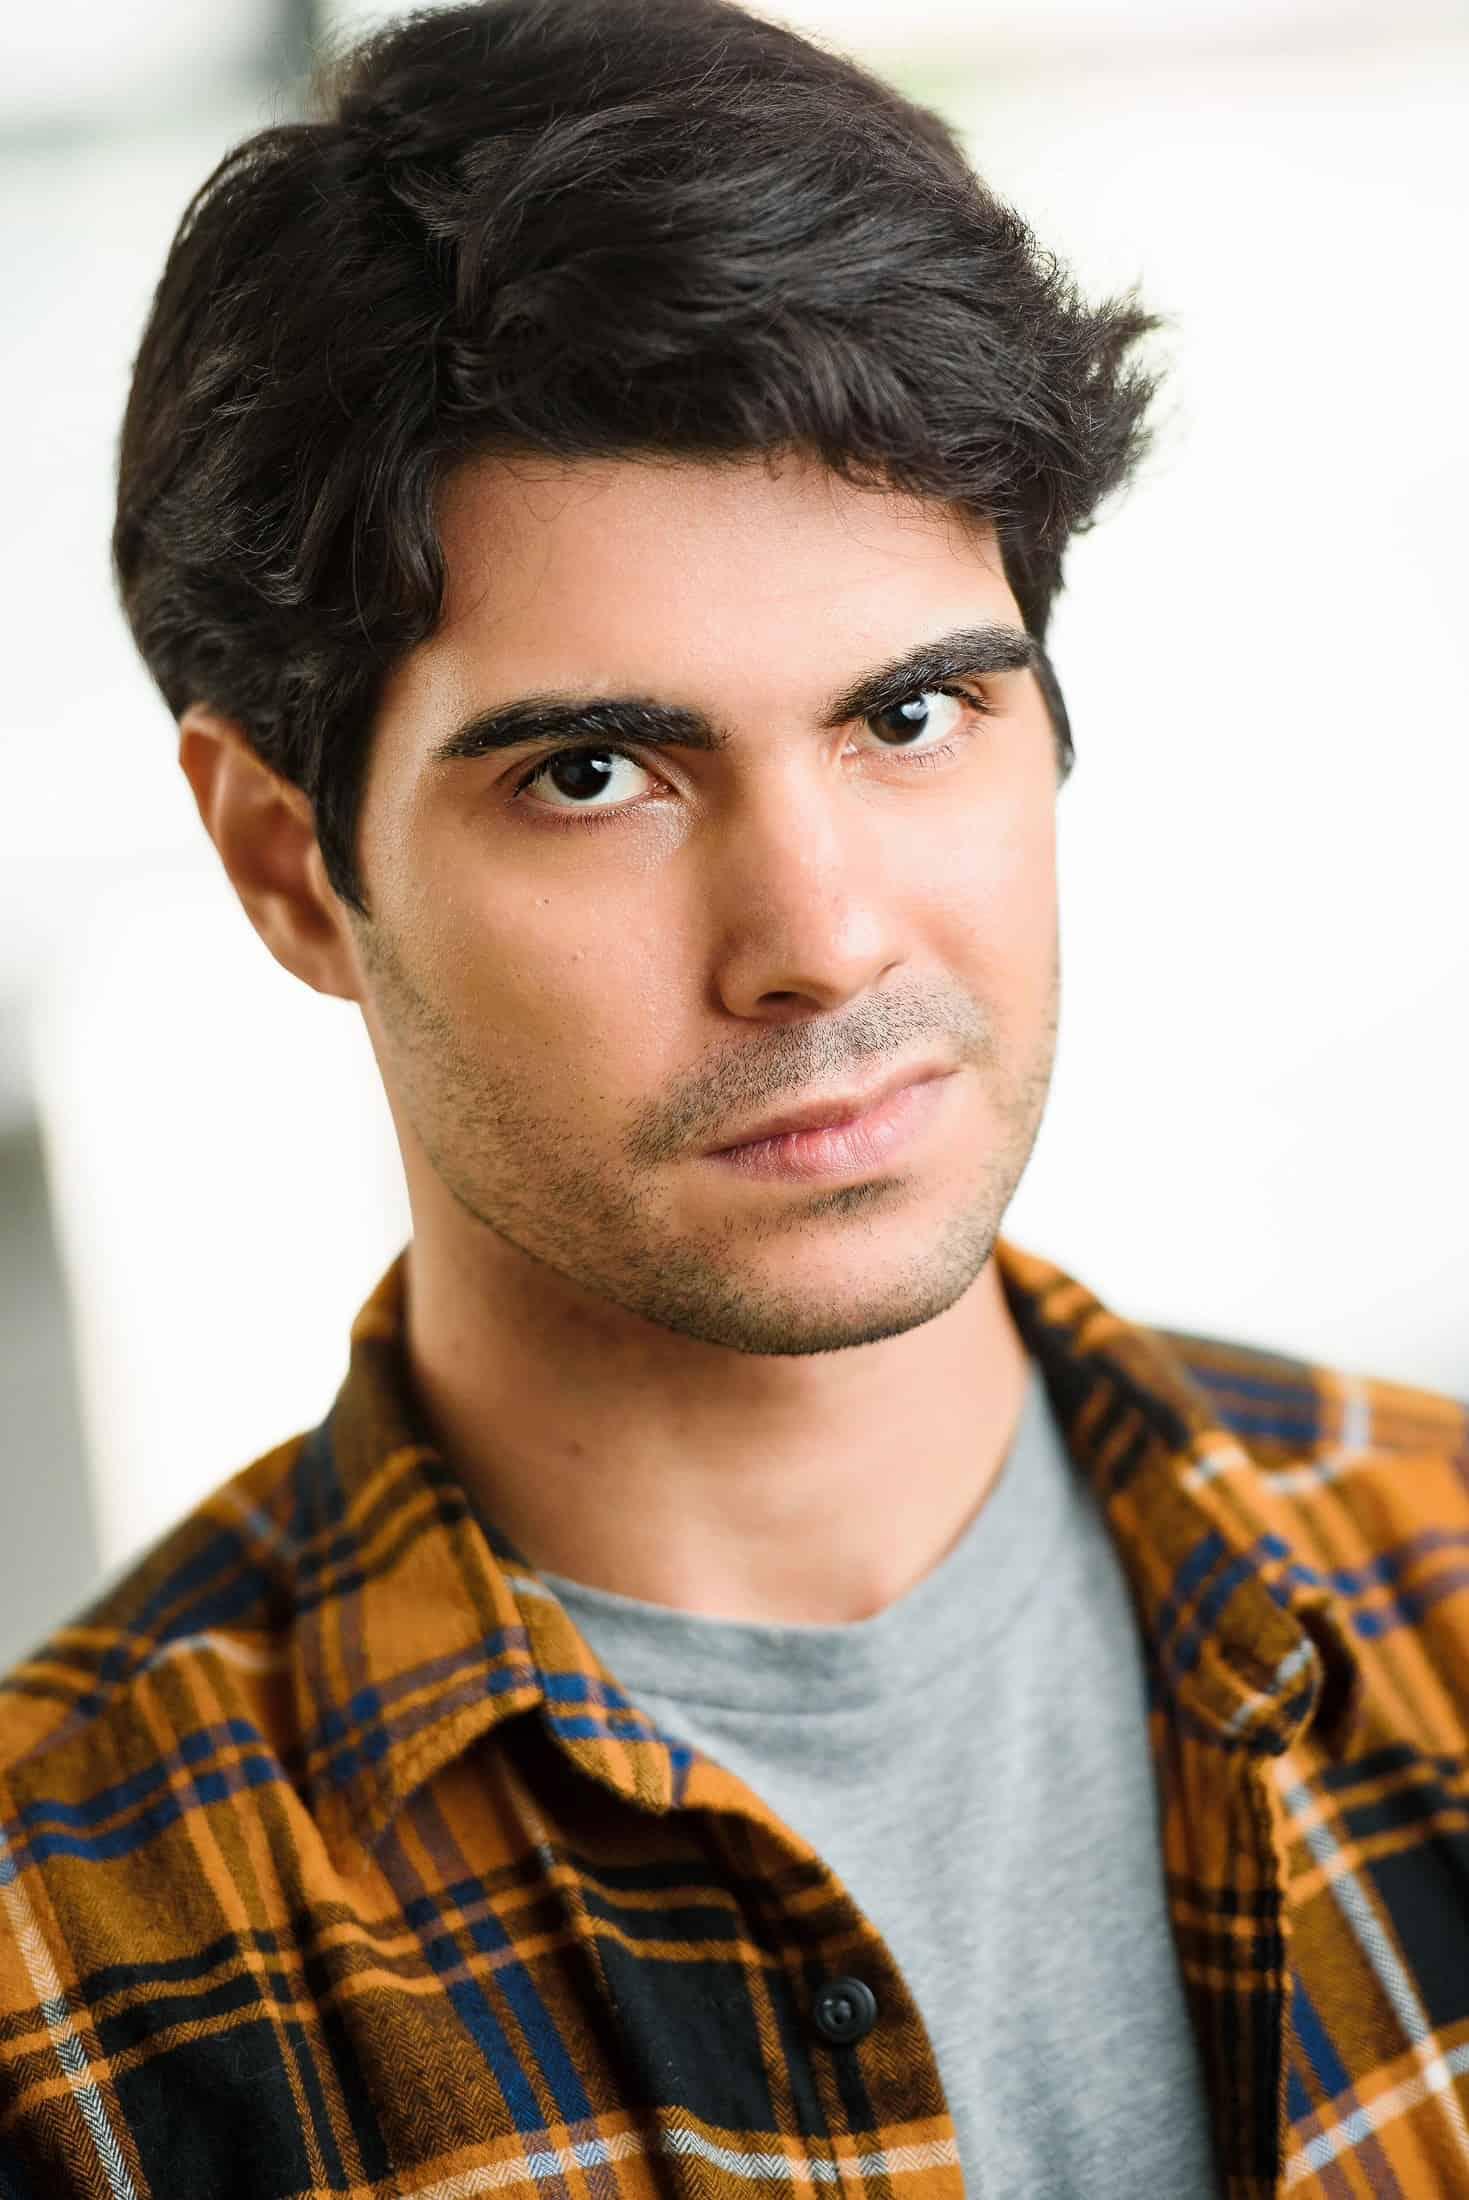 Headshots NYC - Actor Alex M Headshots